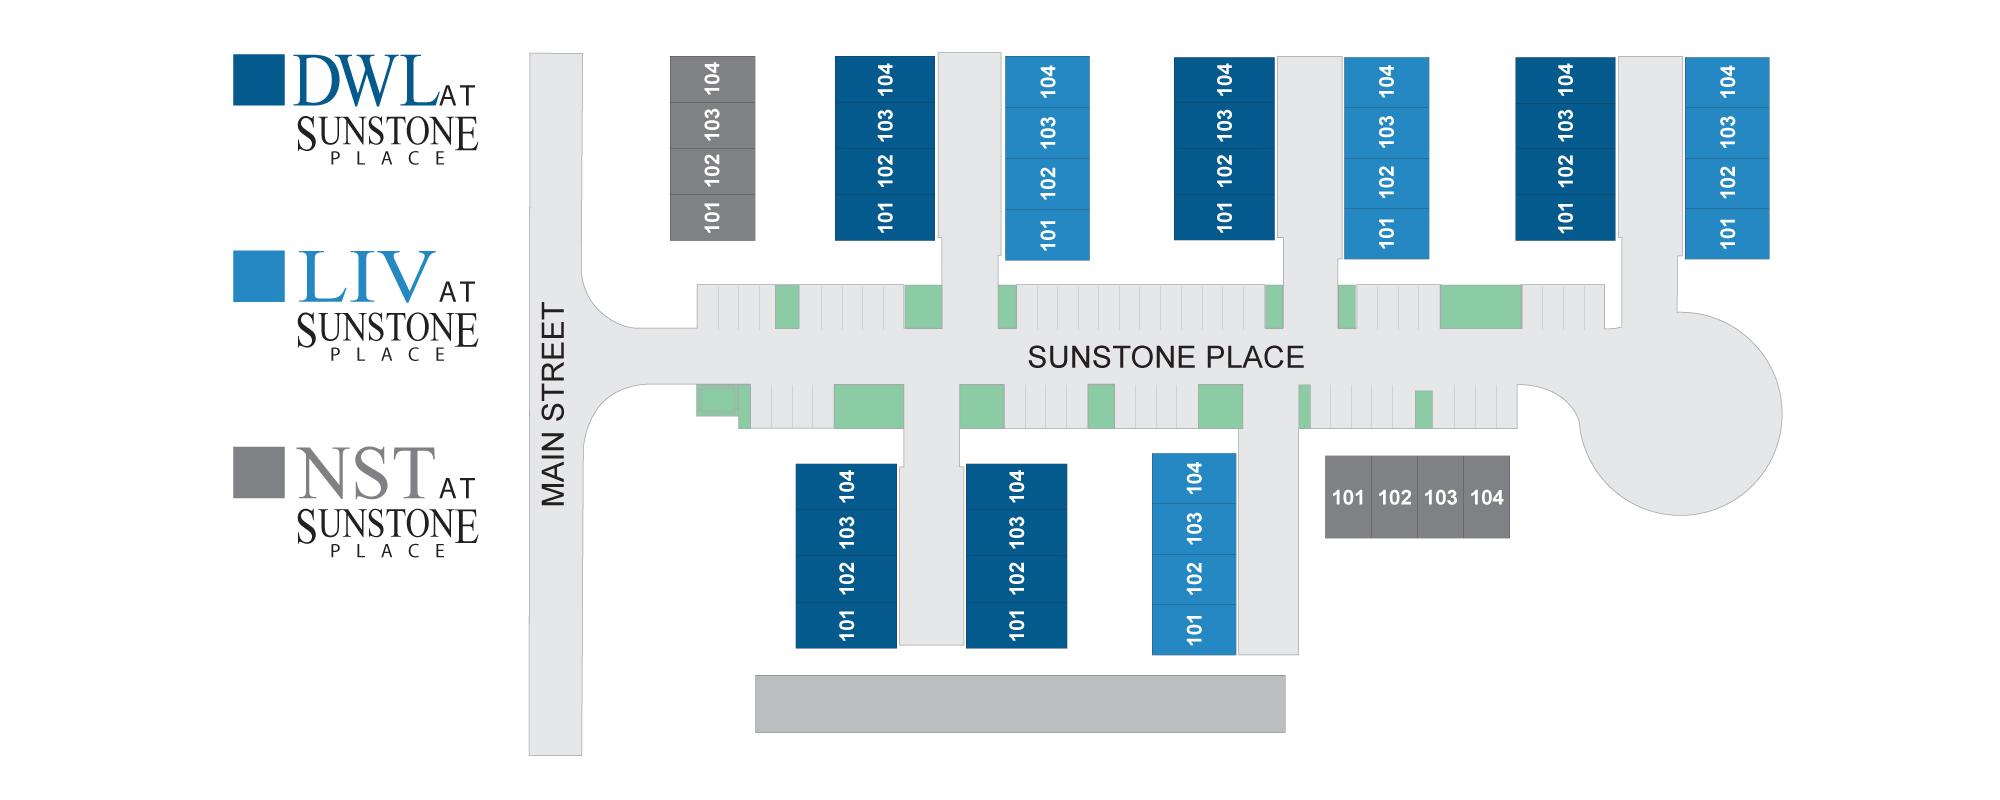 Sunstone Place Hz Map